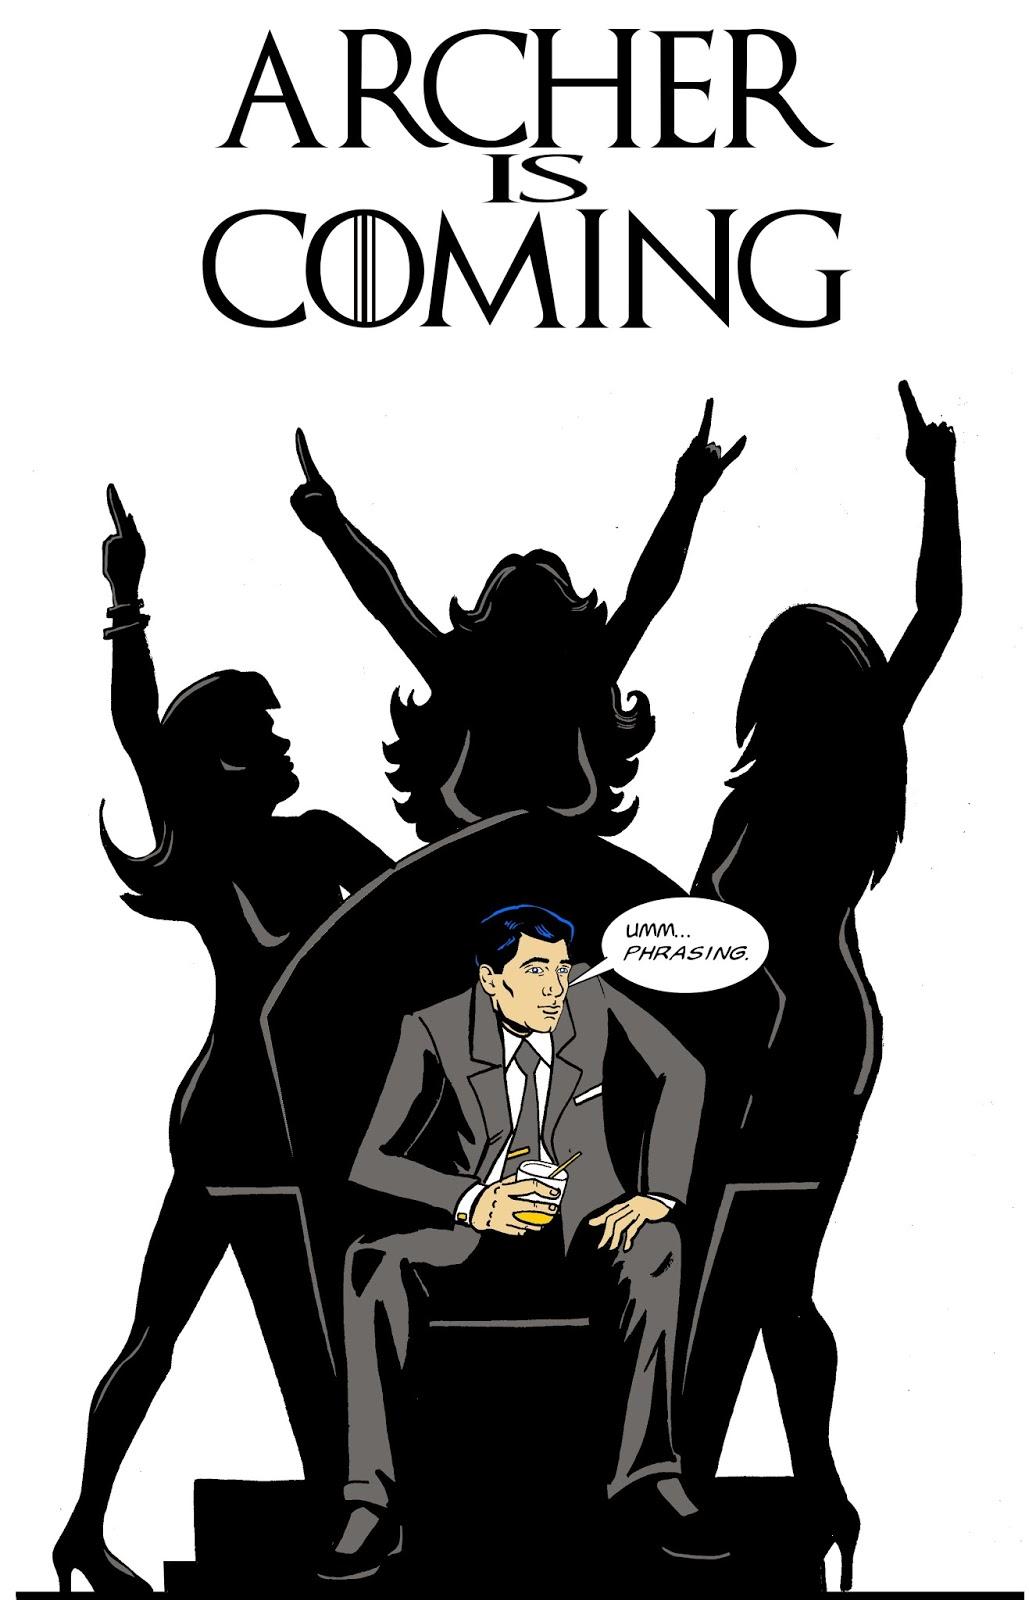 Blakely737 Art, Shirt Designs, and COMICS!!!: November 2013